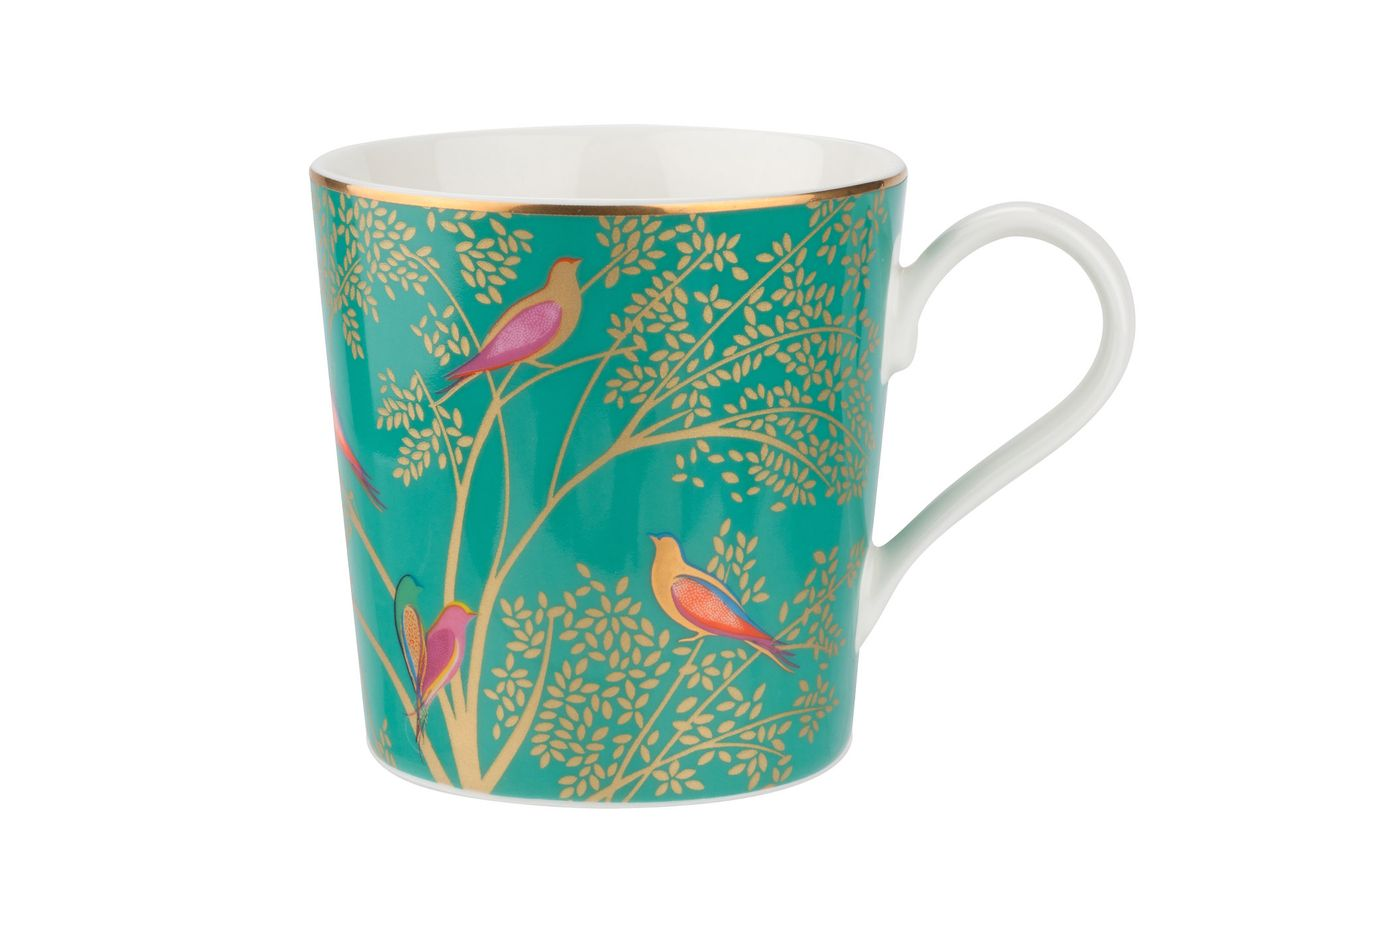 Sara Miller London for Portmeirion Chelsea Collection Mug Green 0.34l thumb 1